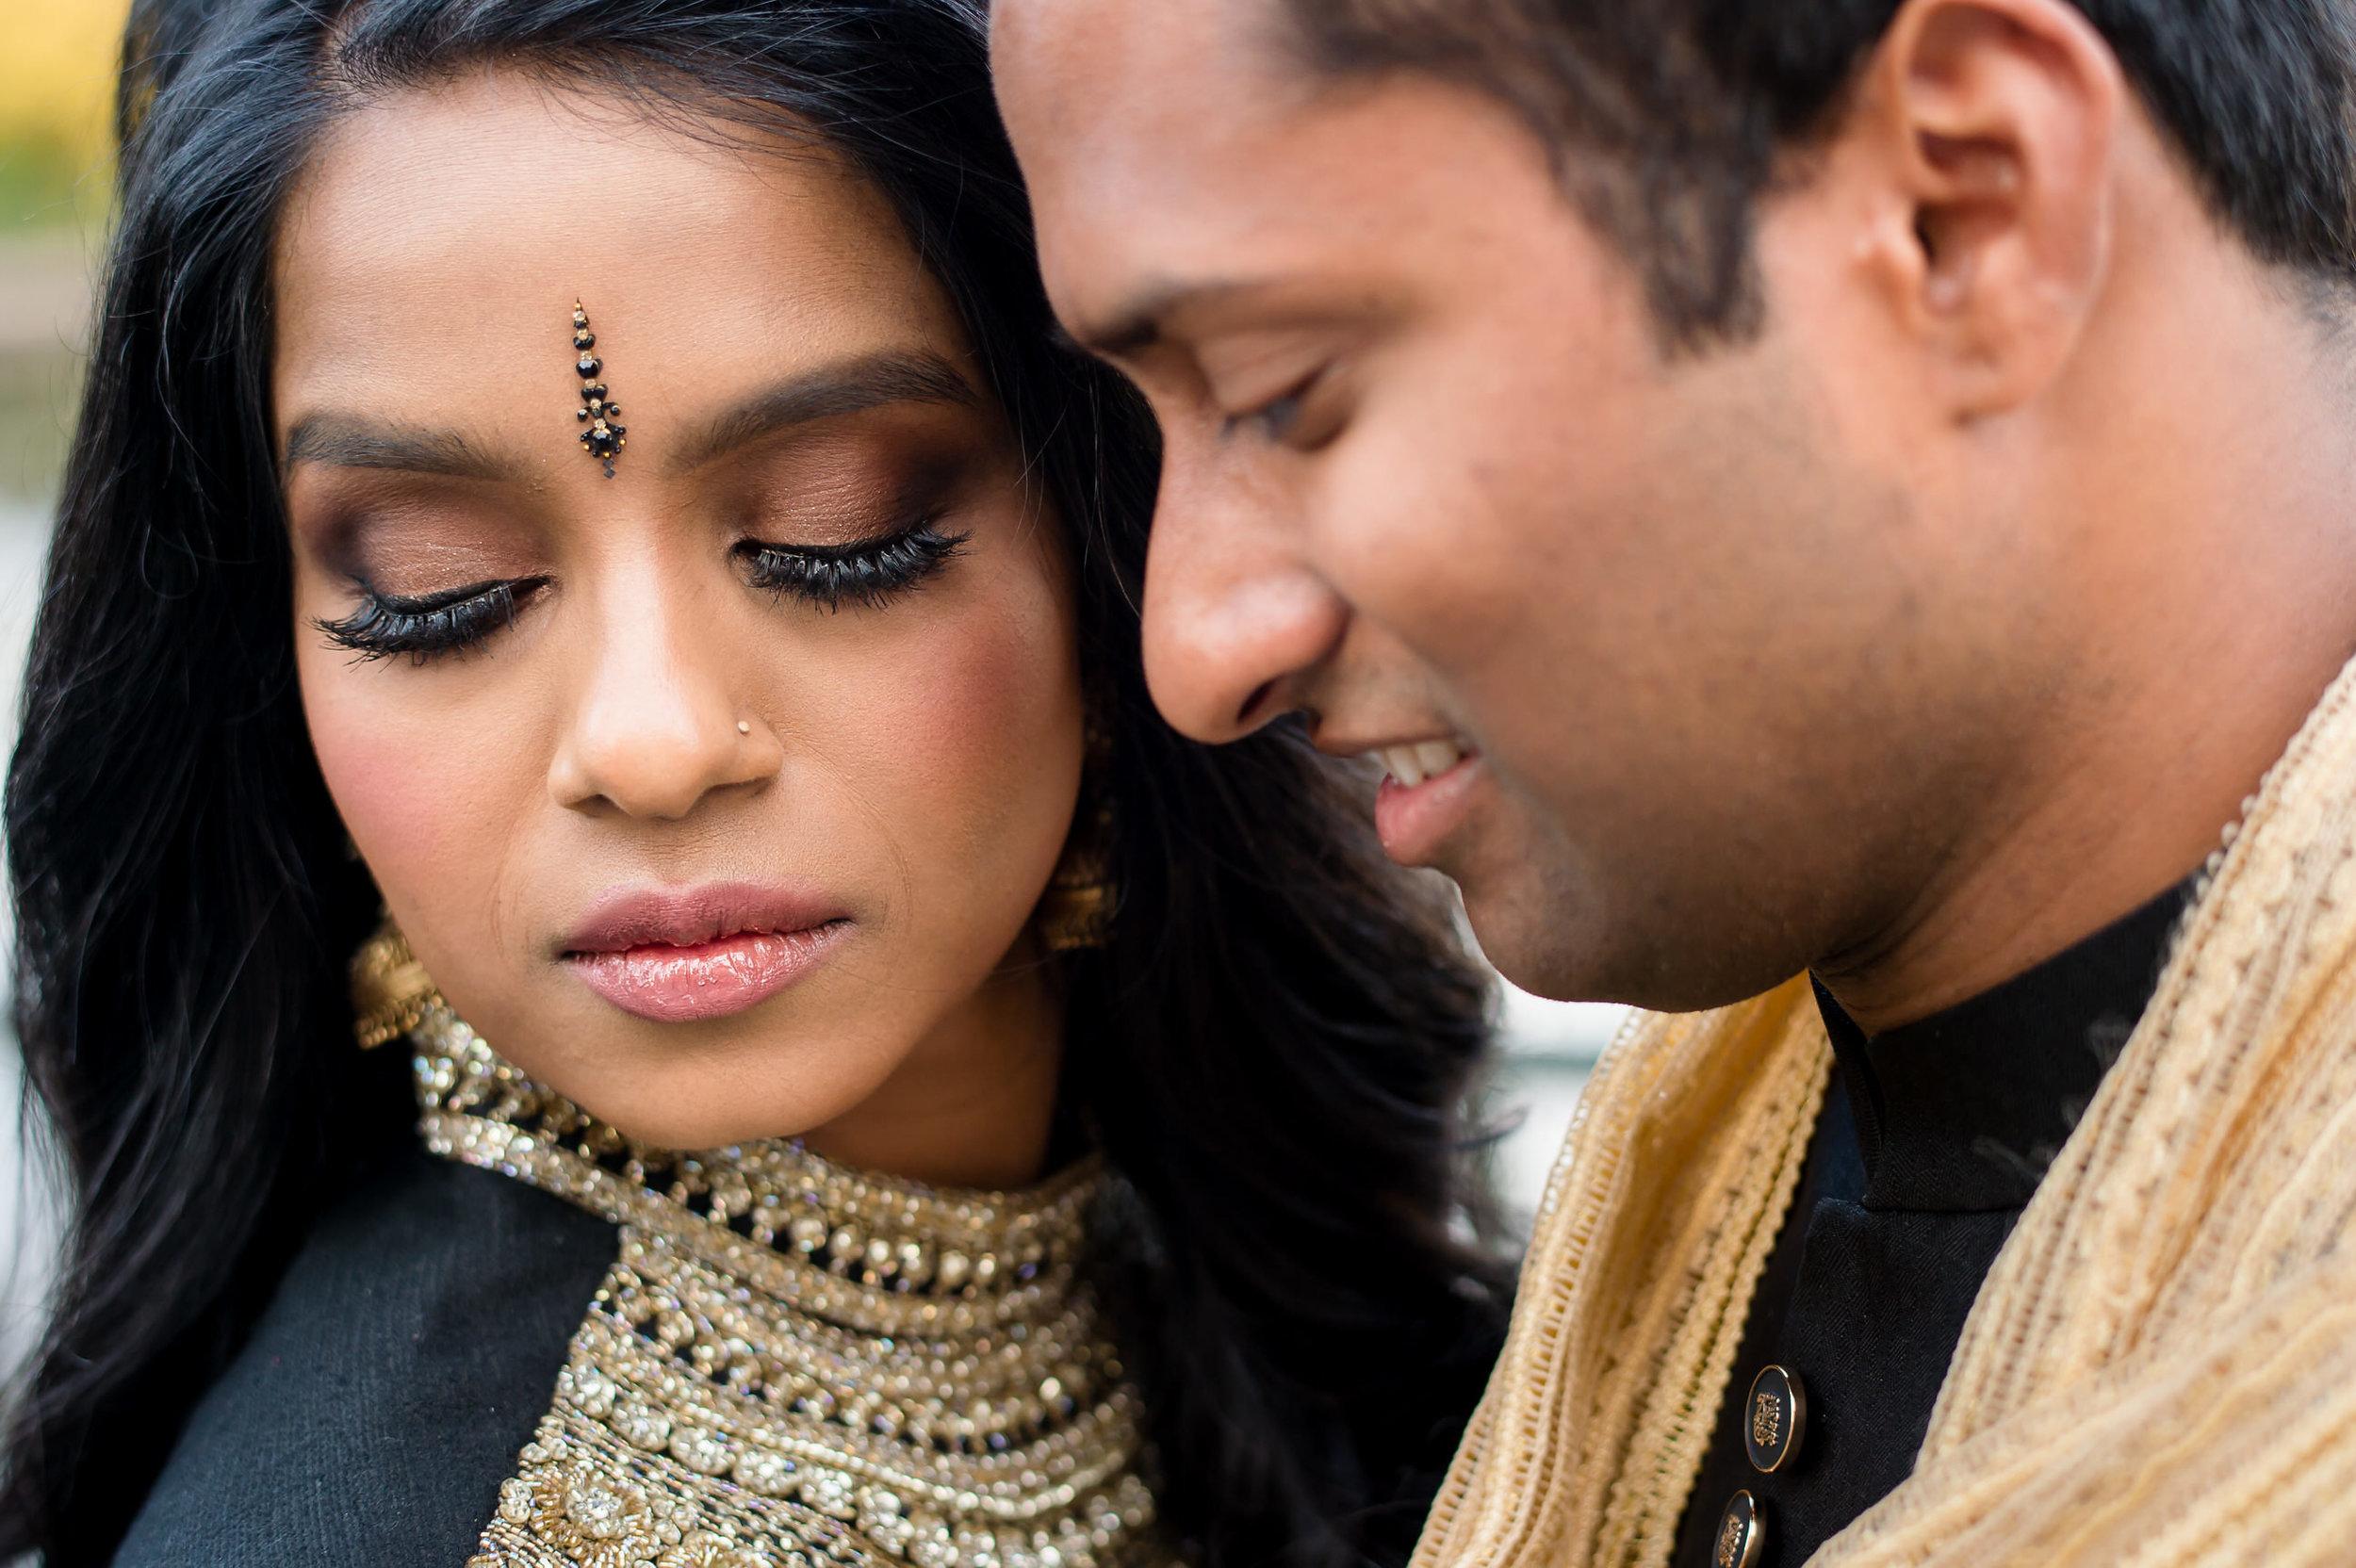 Parneeta-Sravan-Wedding-0079.jpg